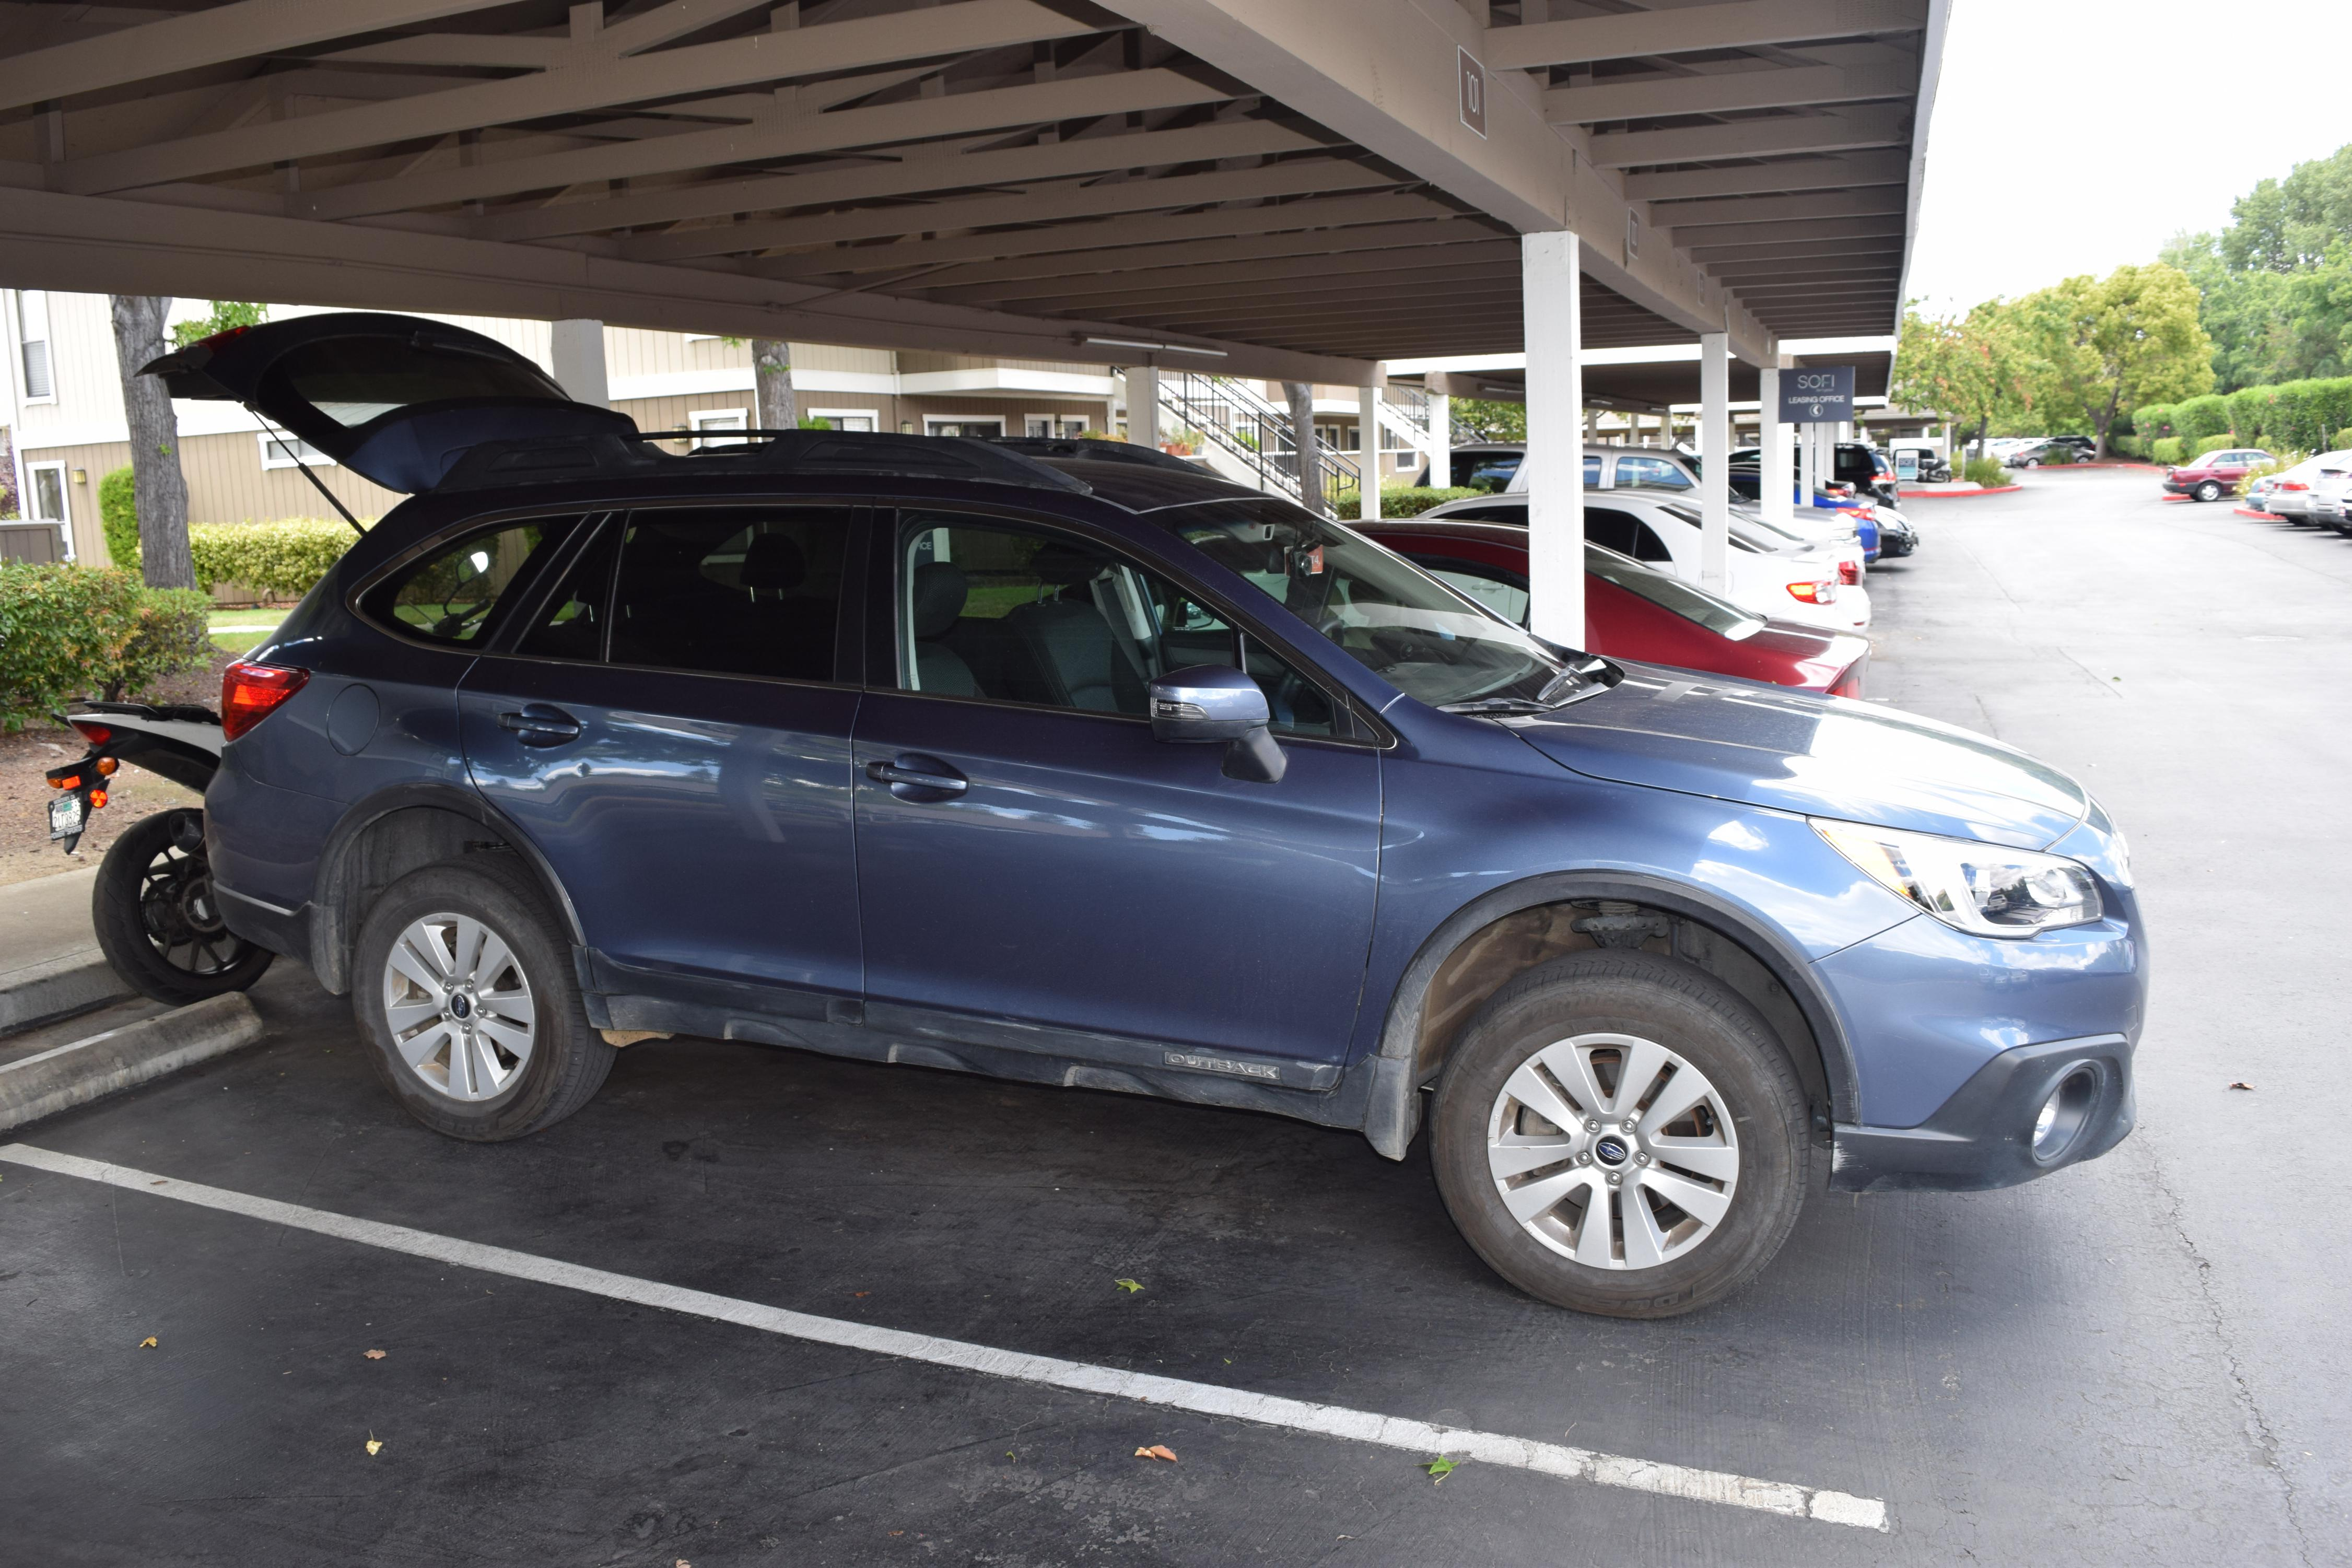 Subaru Outback Lift Kit >> Attention Subaru Lift Kit Problem Subaru Outback Forums